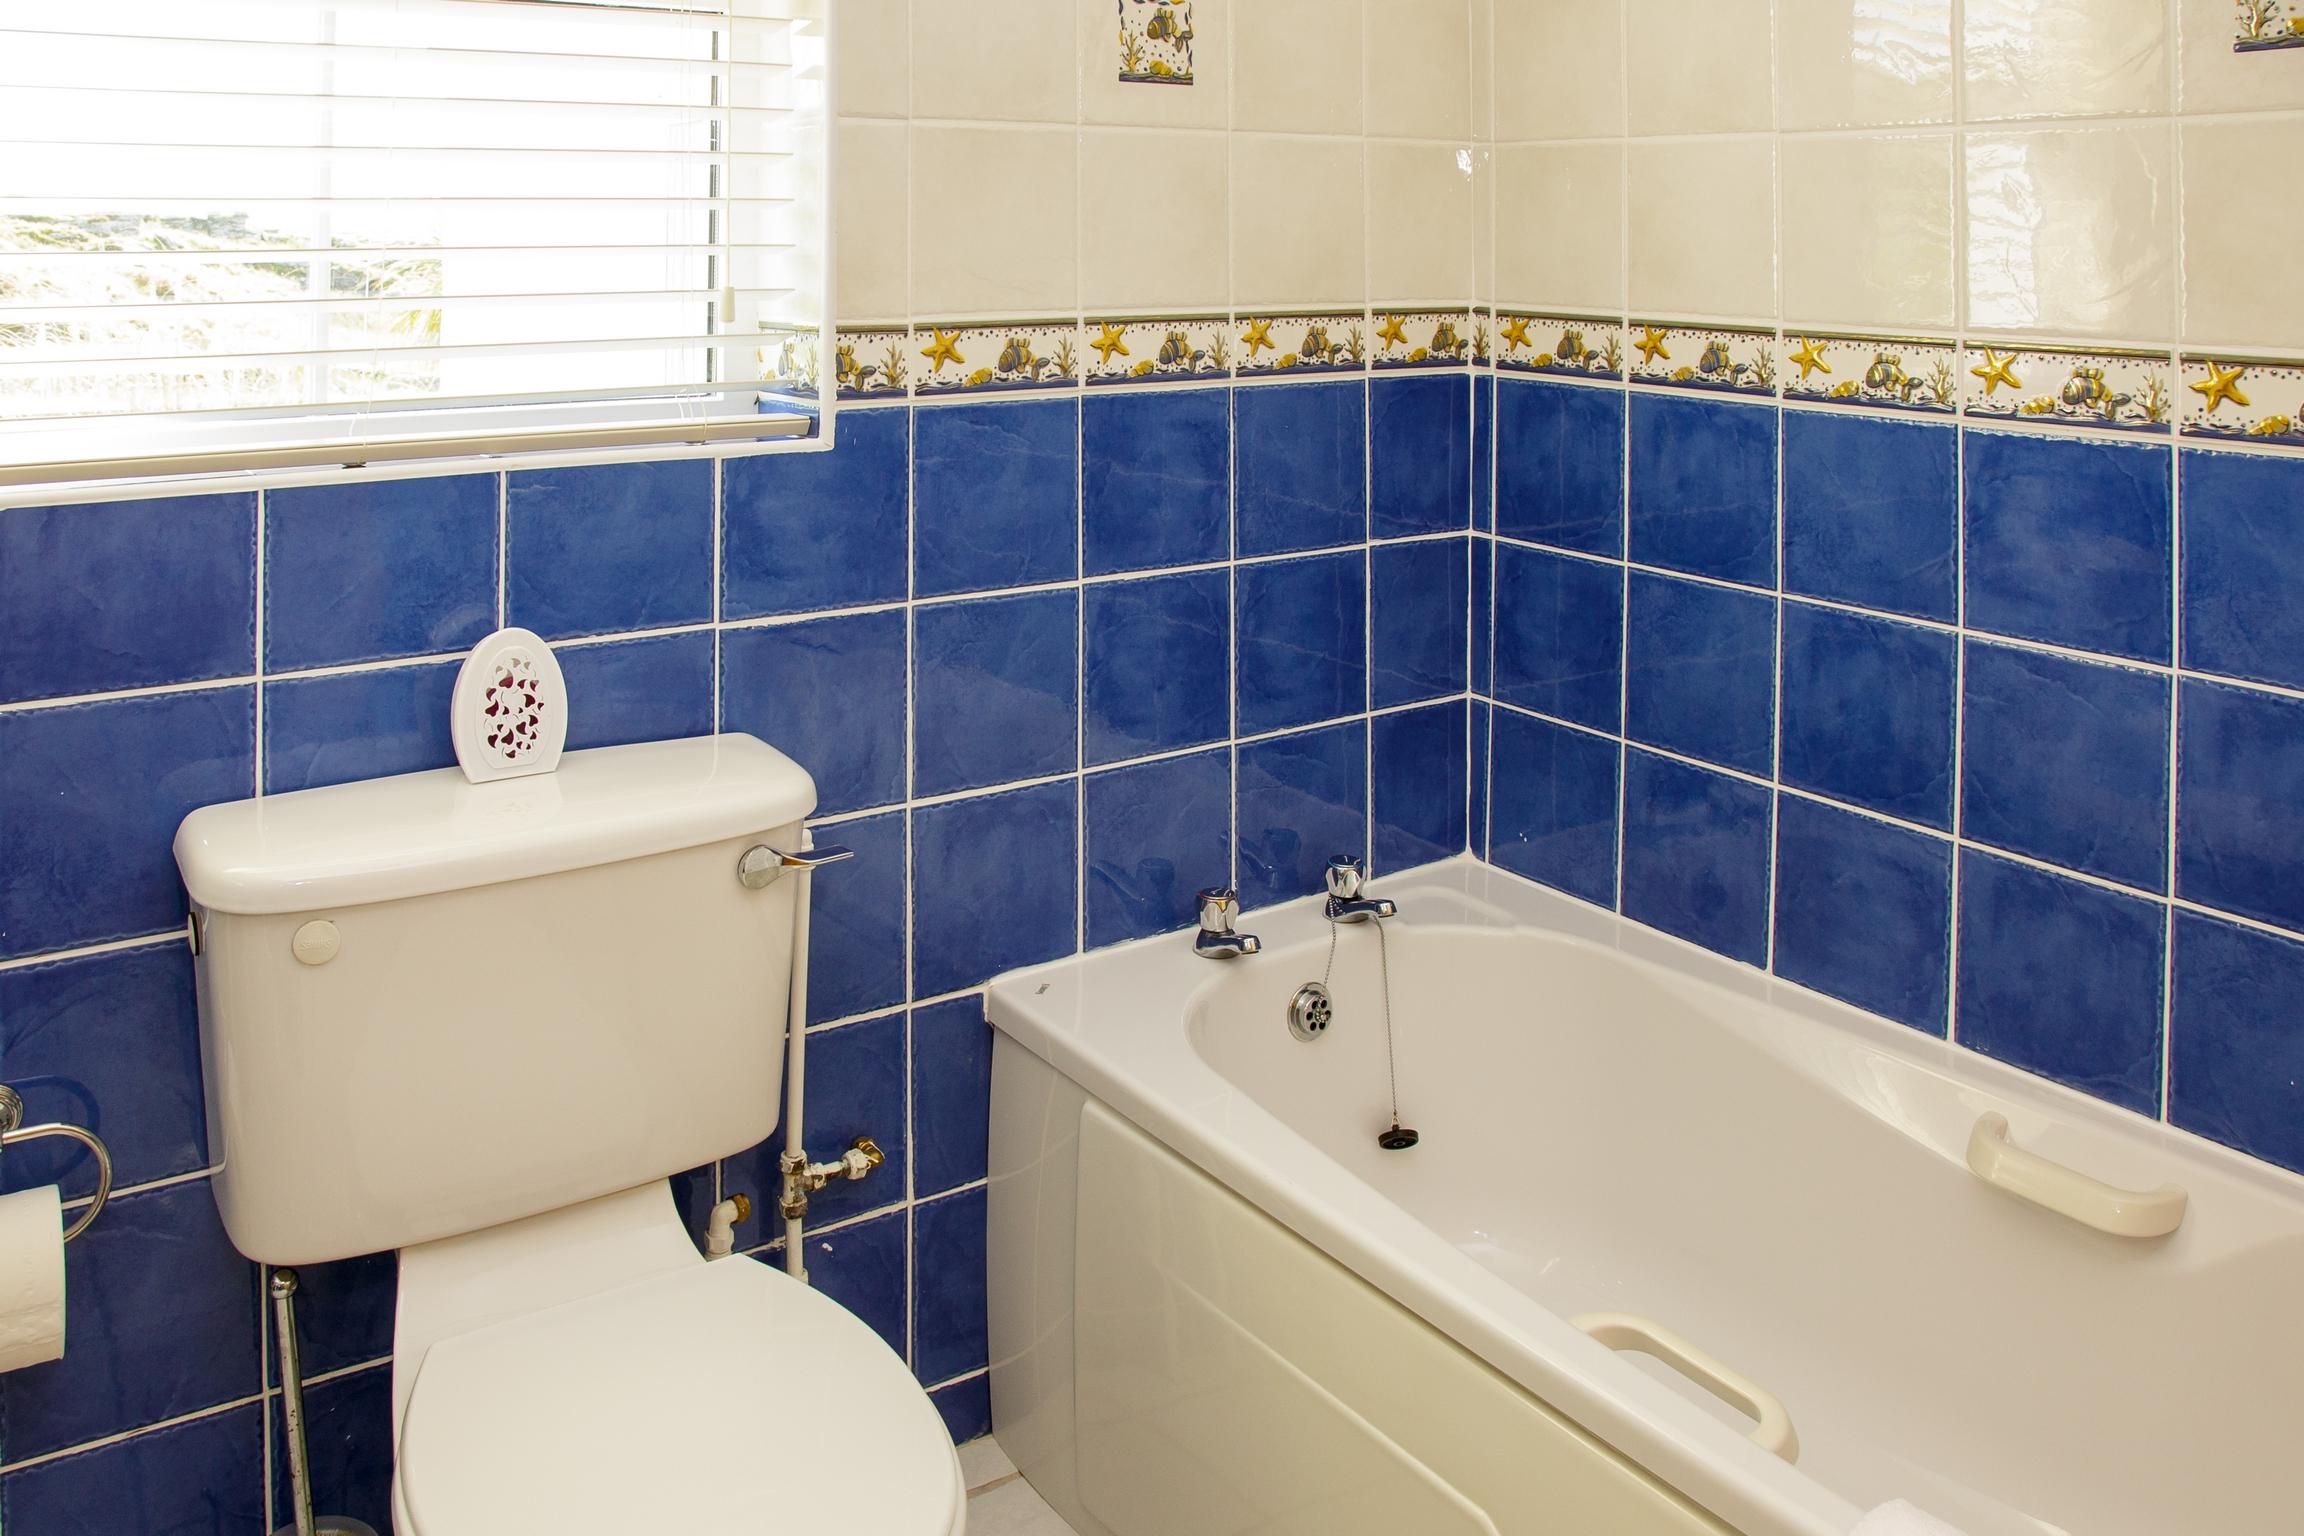 1 Ferienhaus, Kerry, Irland, Serenity,Bathroom 1, Holiday Home ...